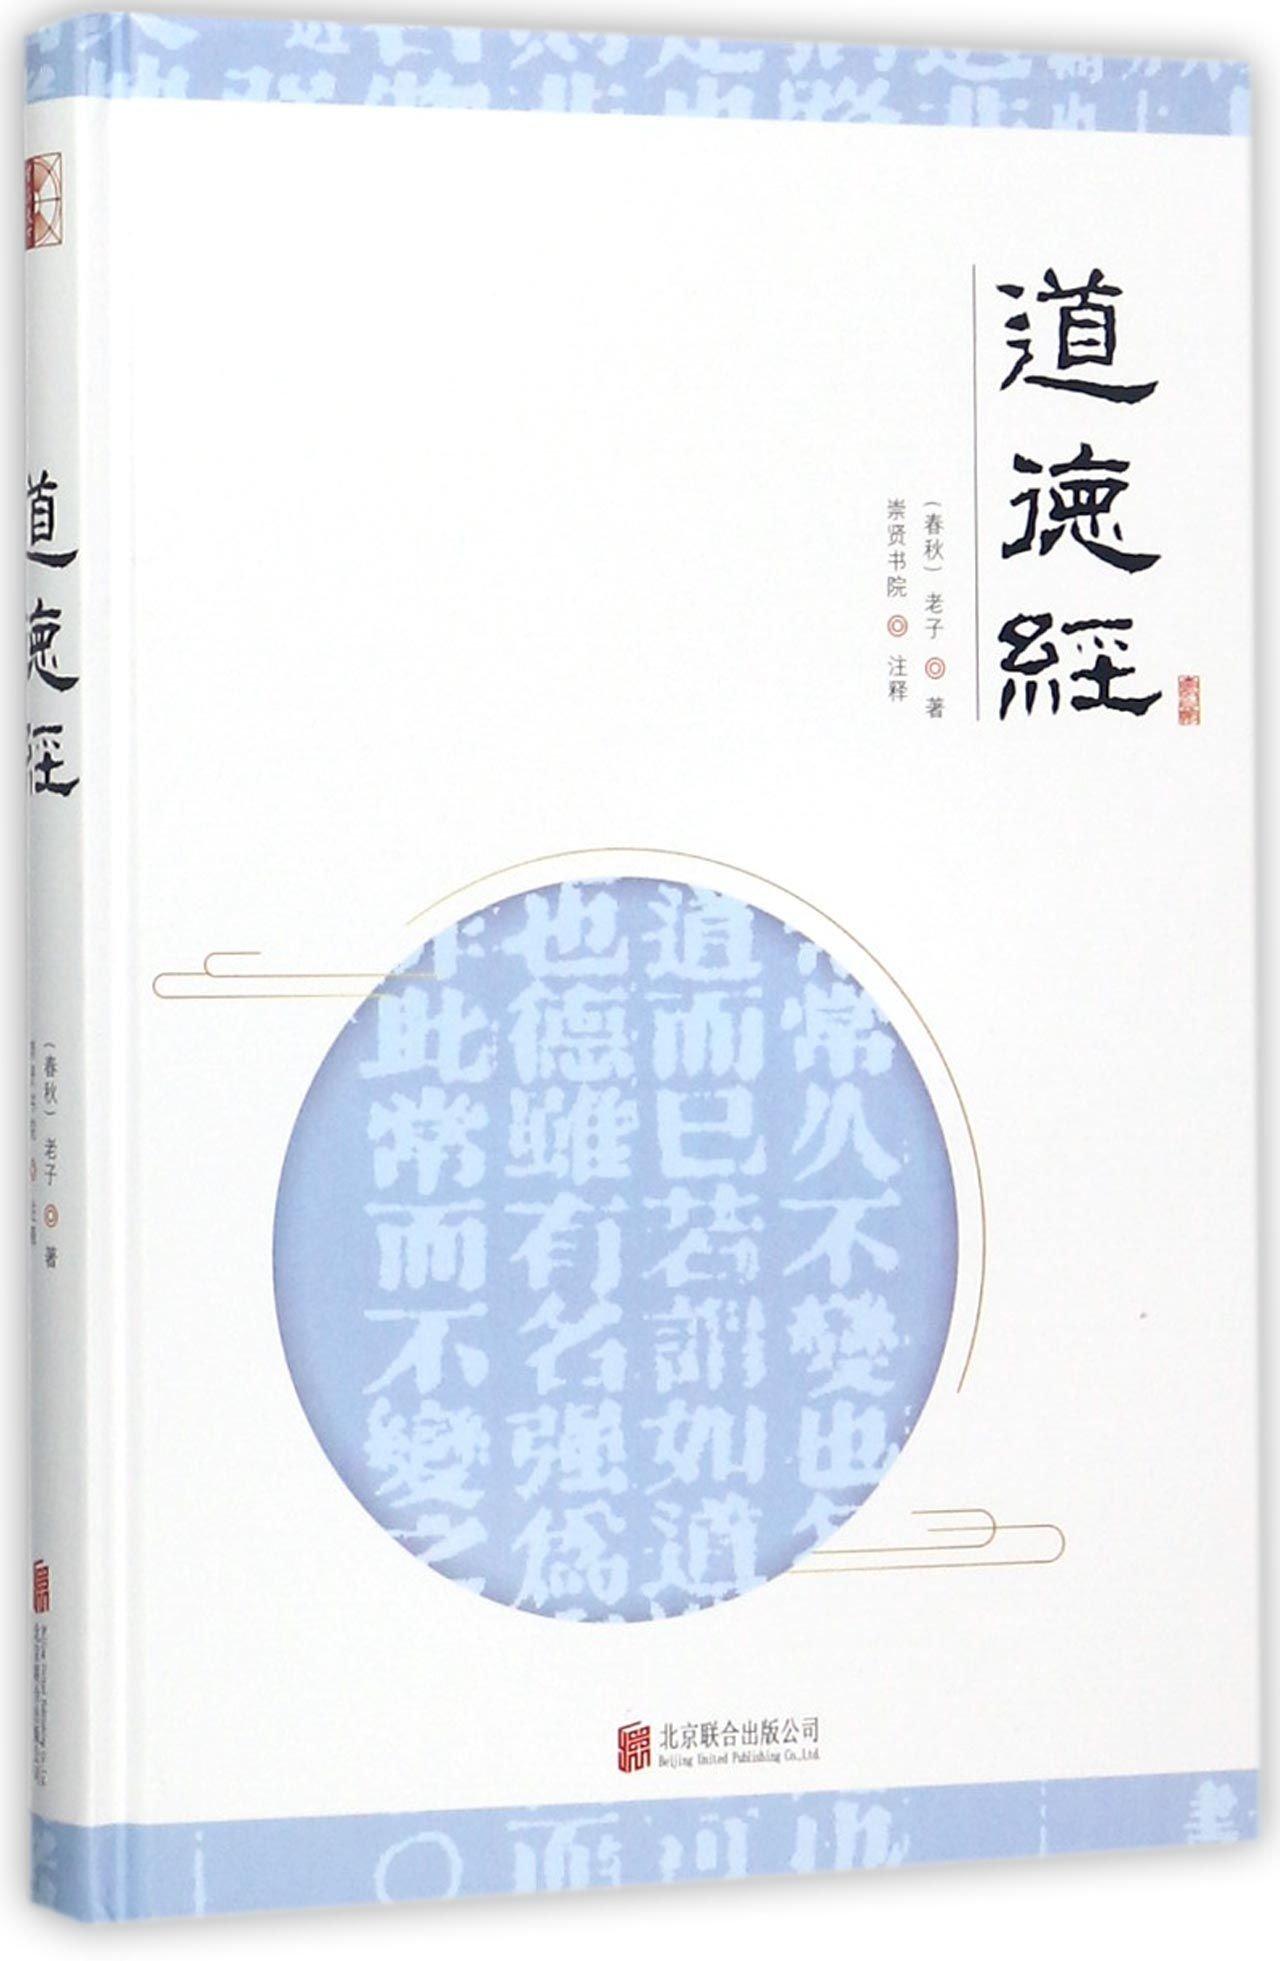 Tao Te Ching (Chinese Edition)